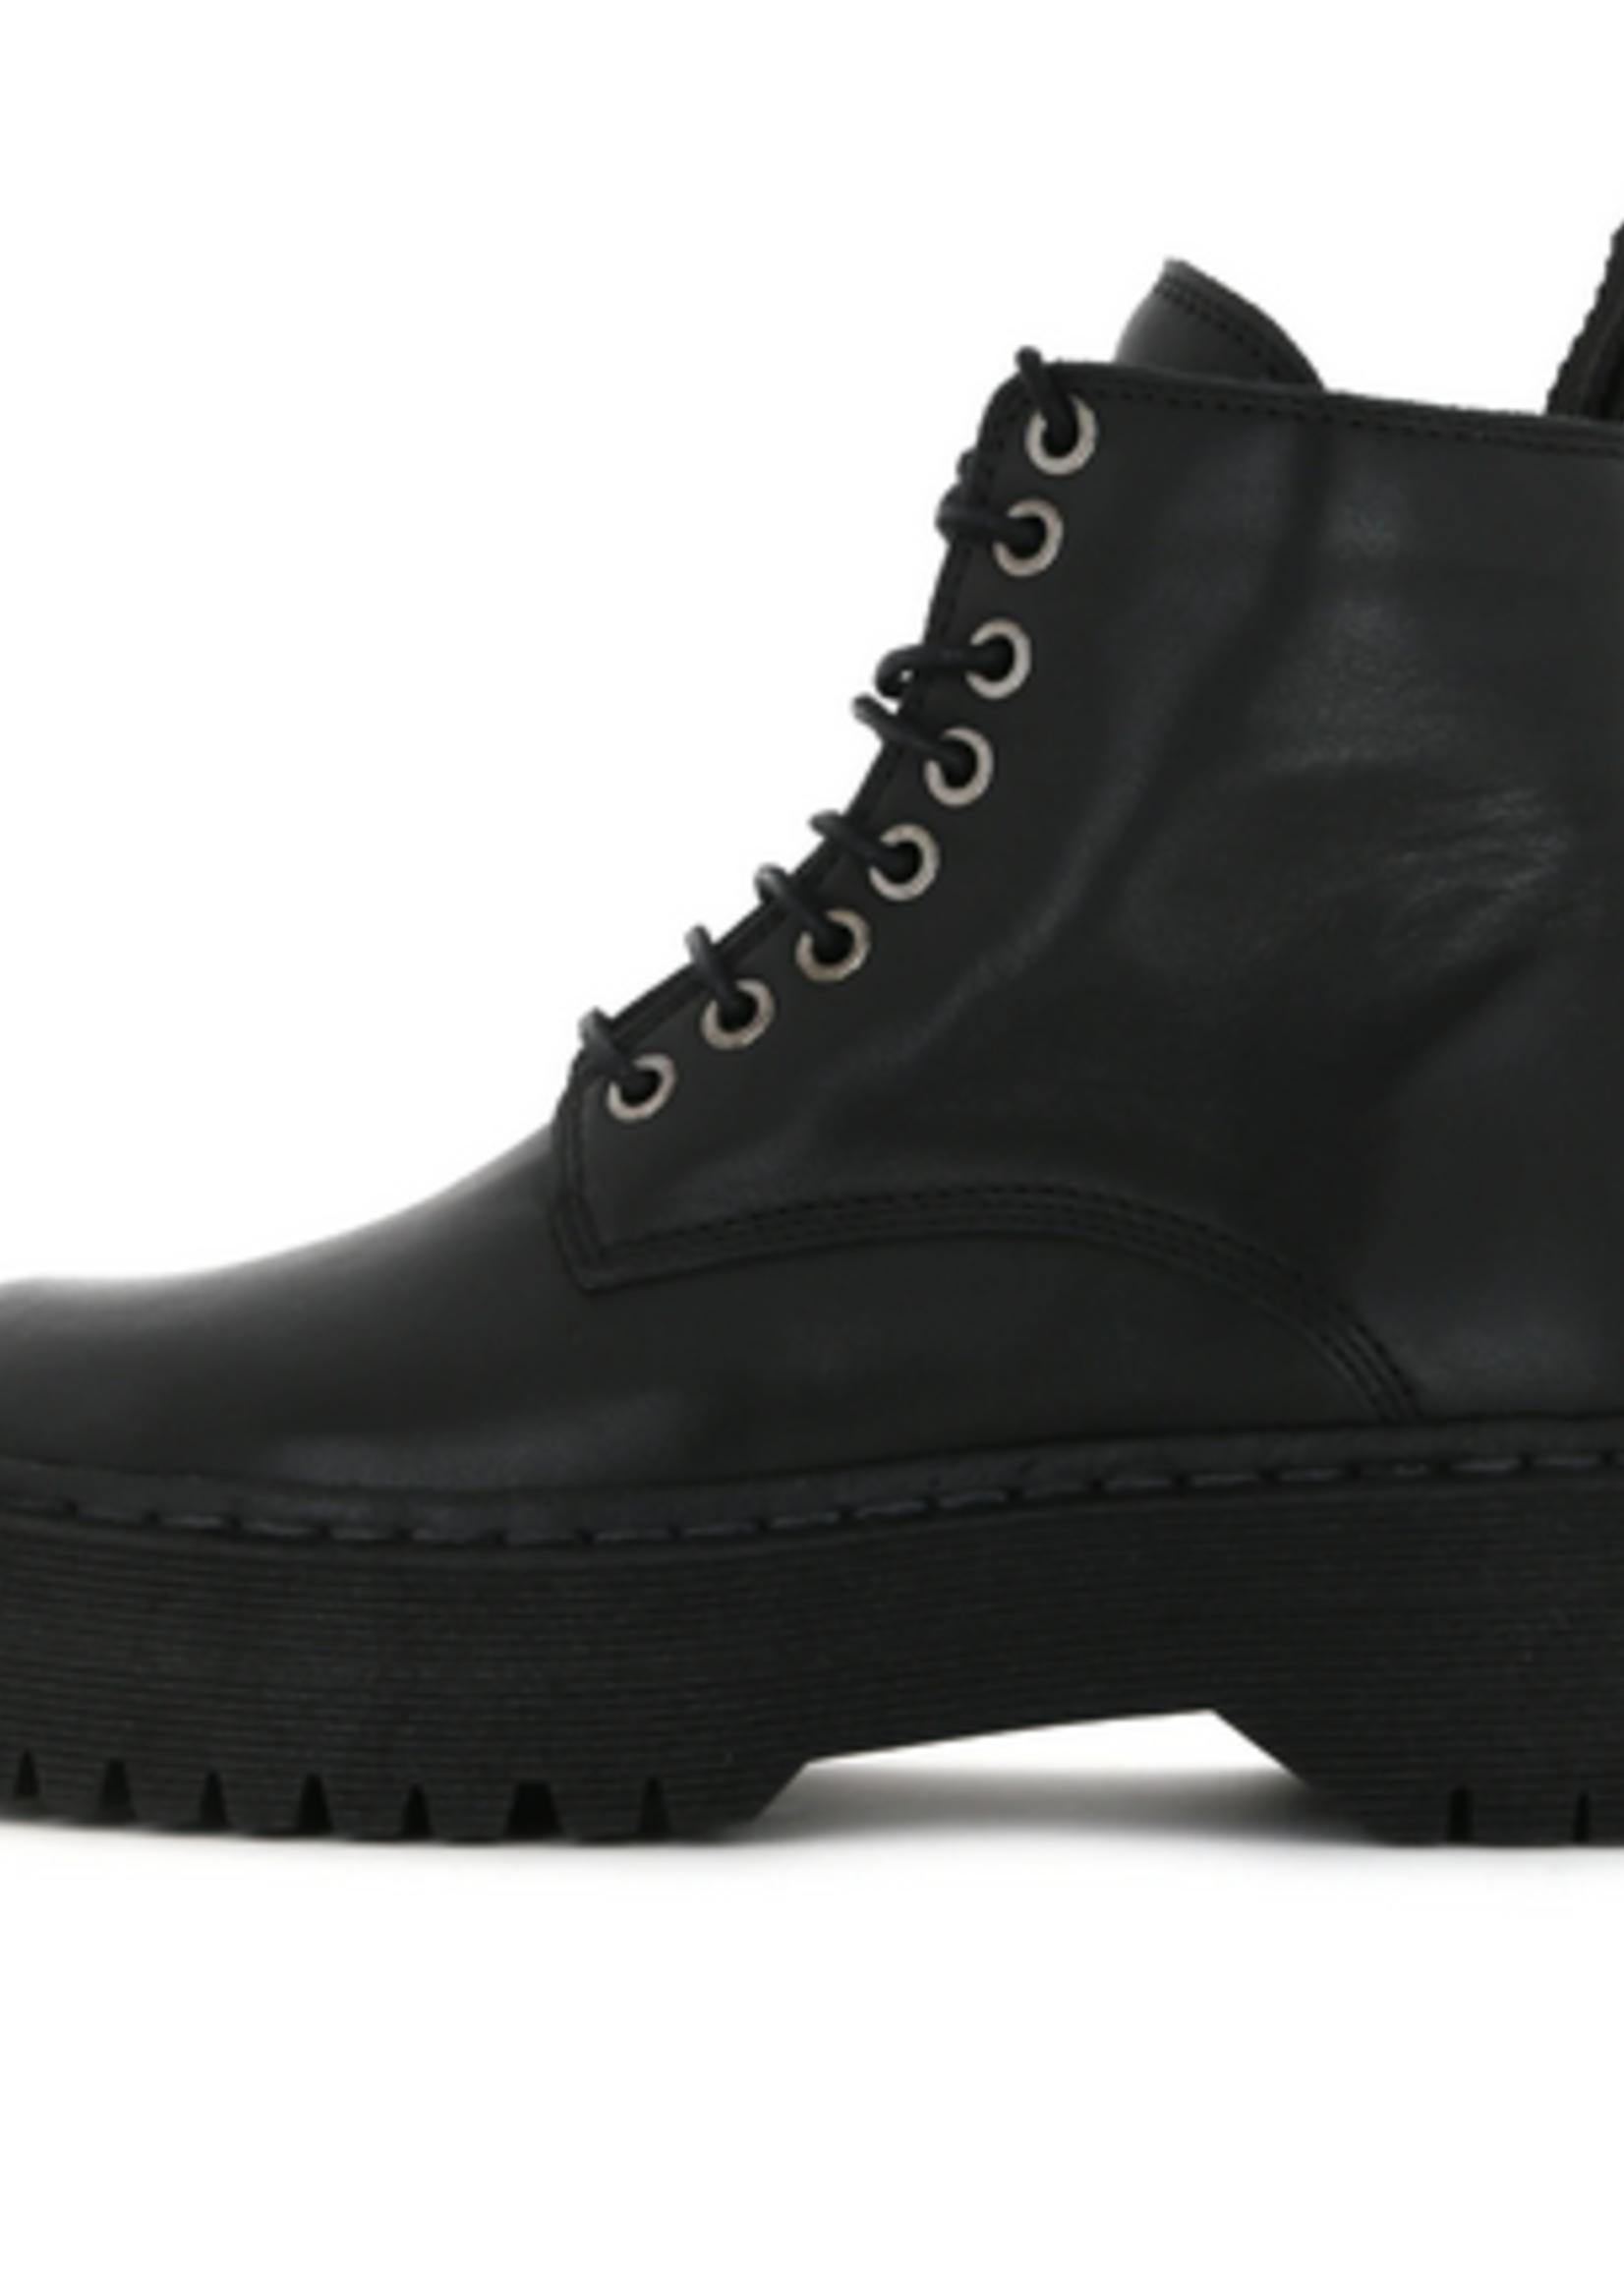 Royal Republiq Command Lace Up Boot